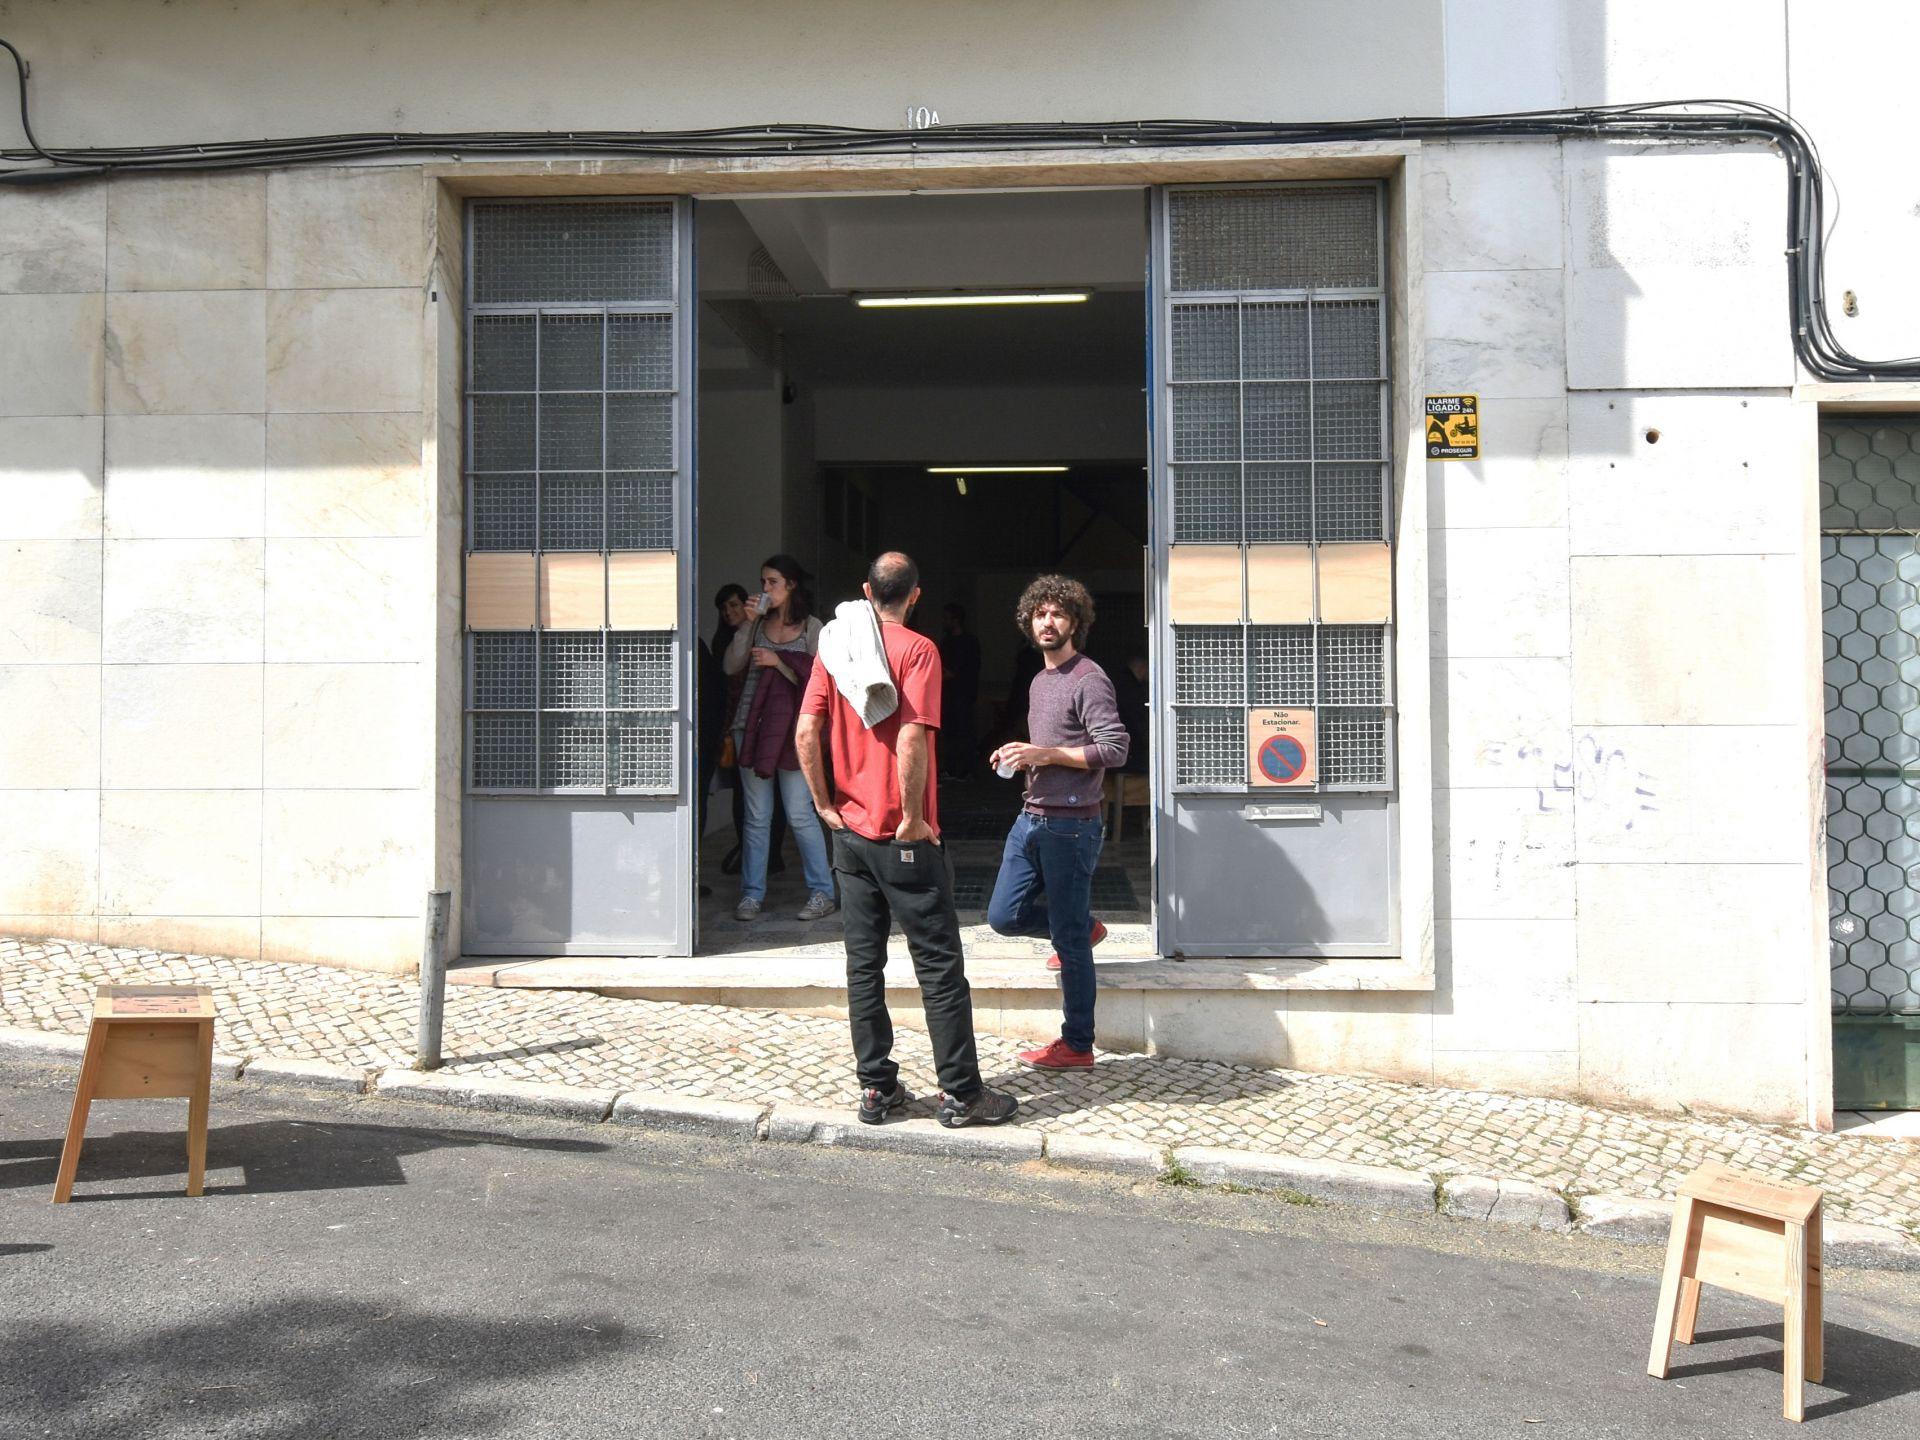 Ateliers da Penha, Lisbon